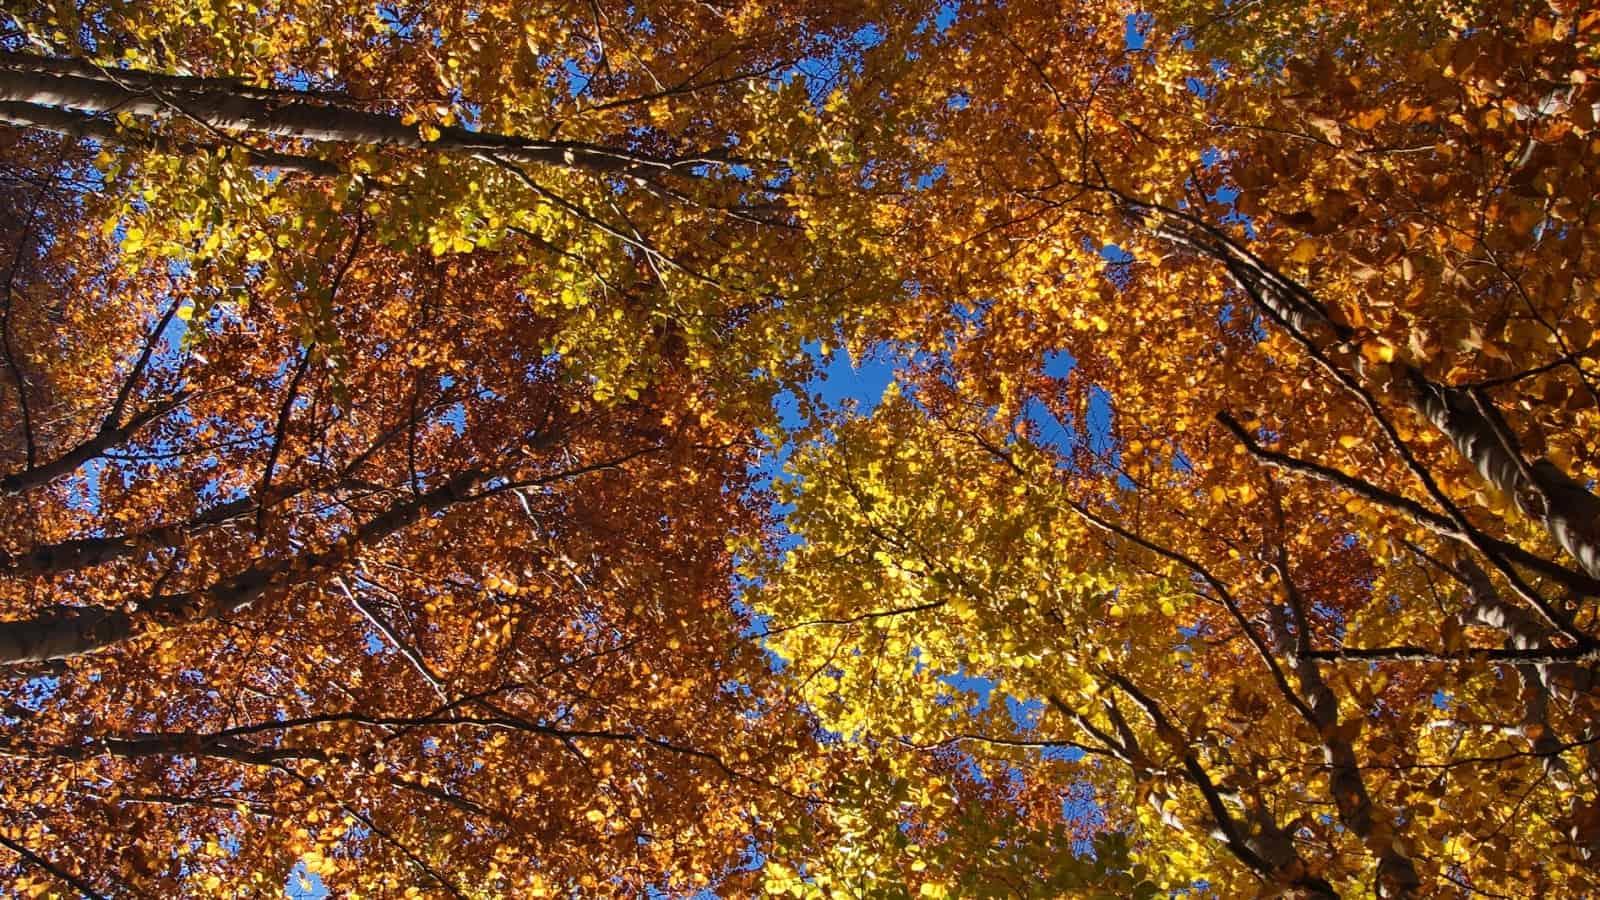 Laubverfärbung im Herbst - Foto: Naturpark Vachranski Balkan/Krasimir Lakovski